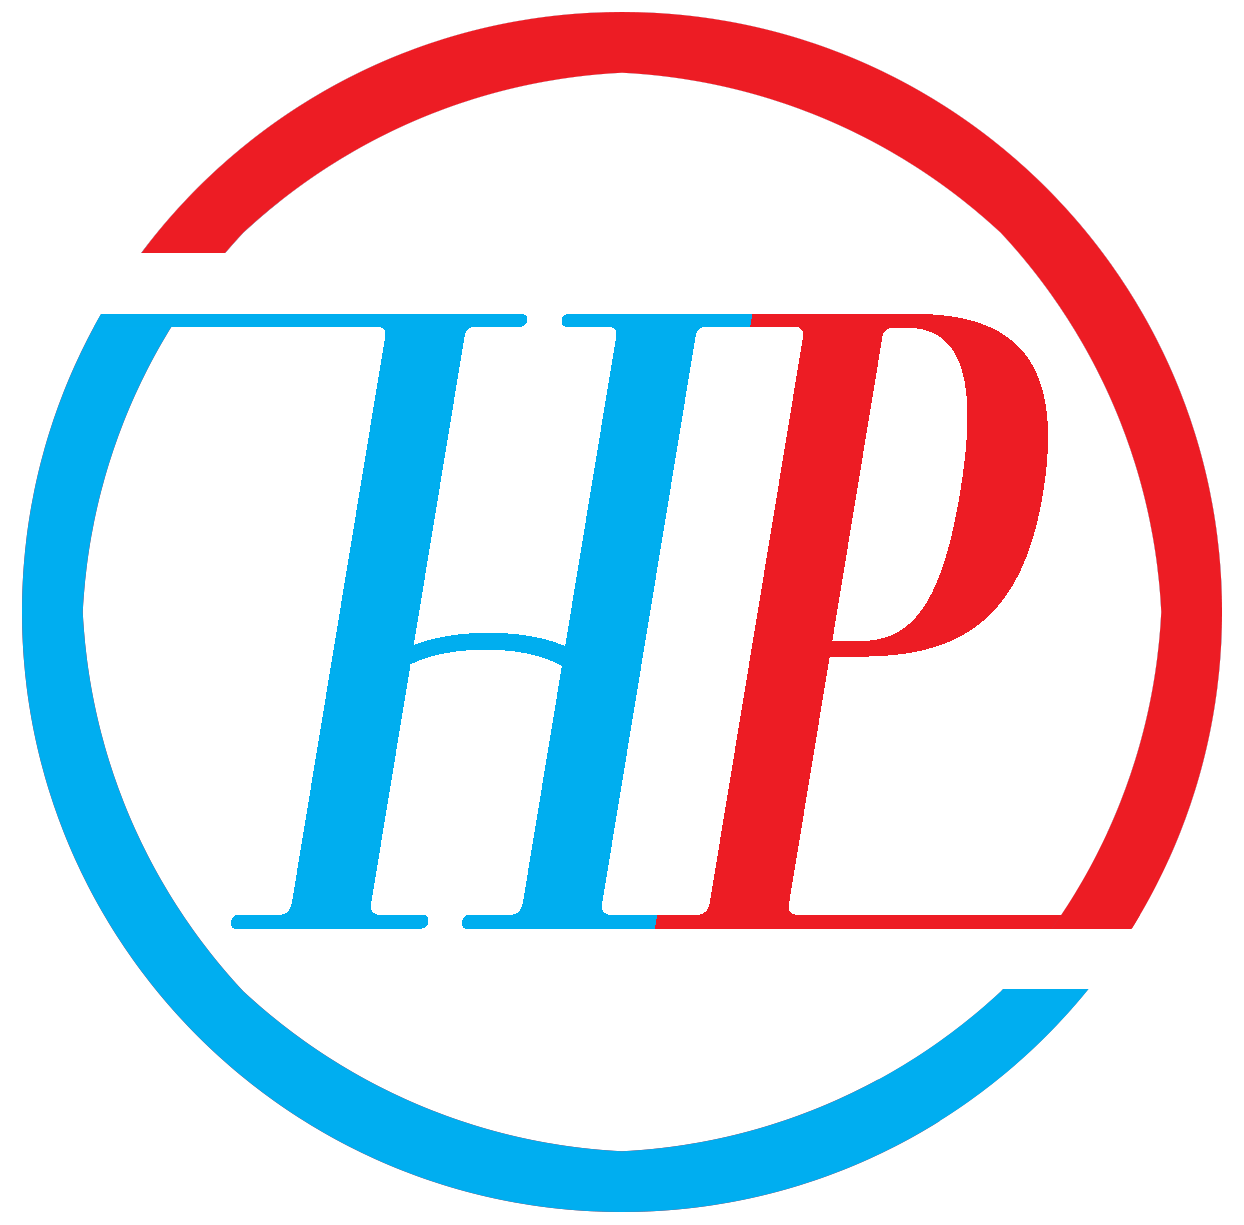 logo-hungphat